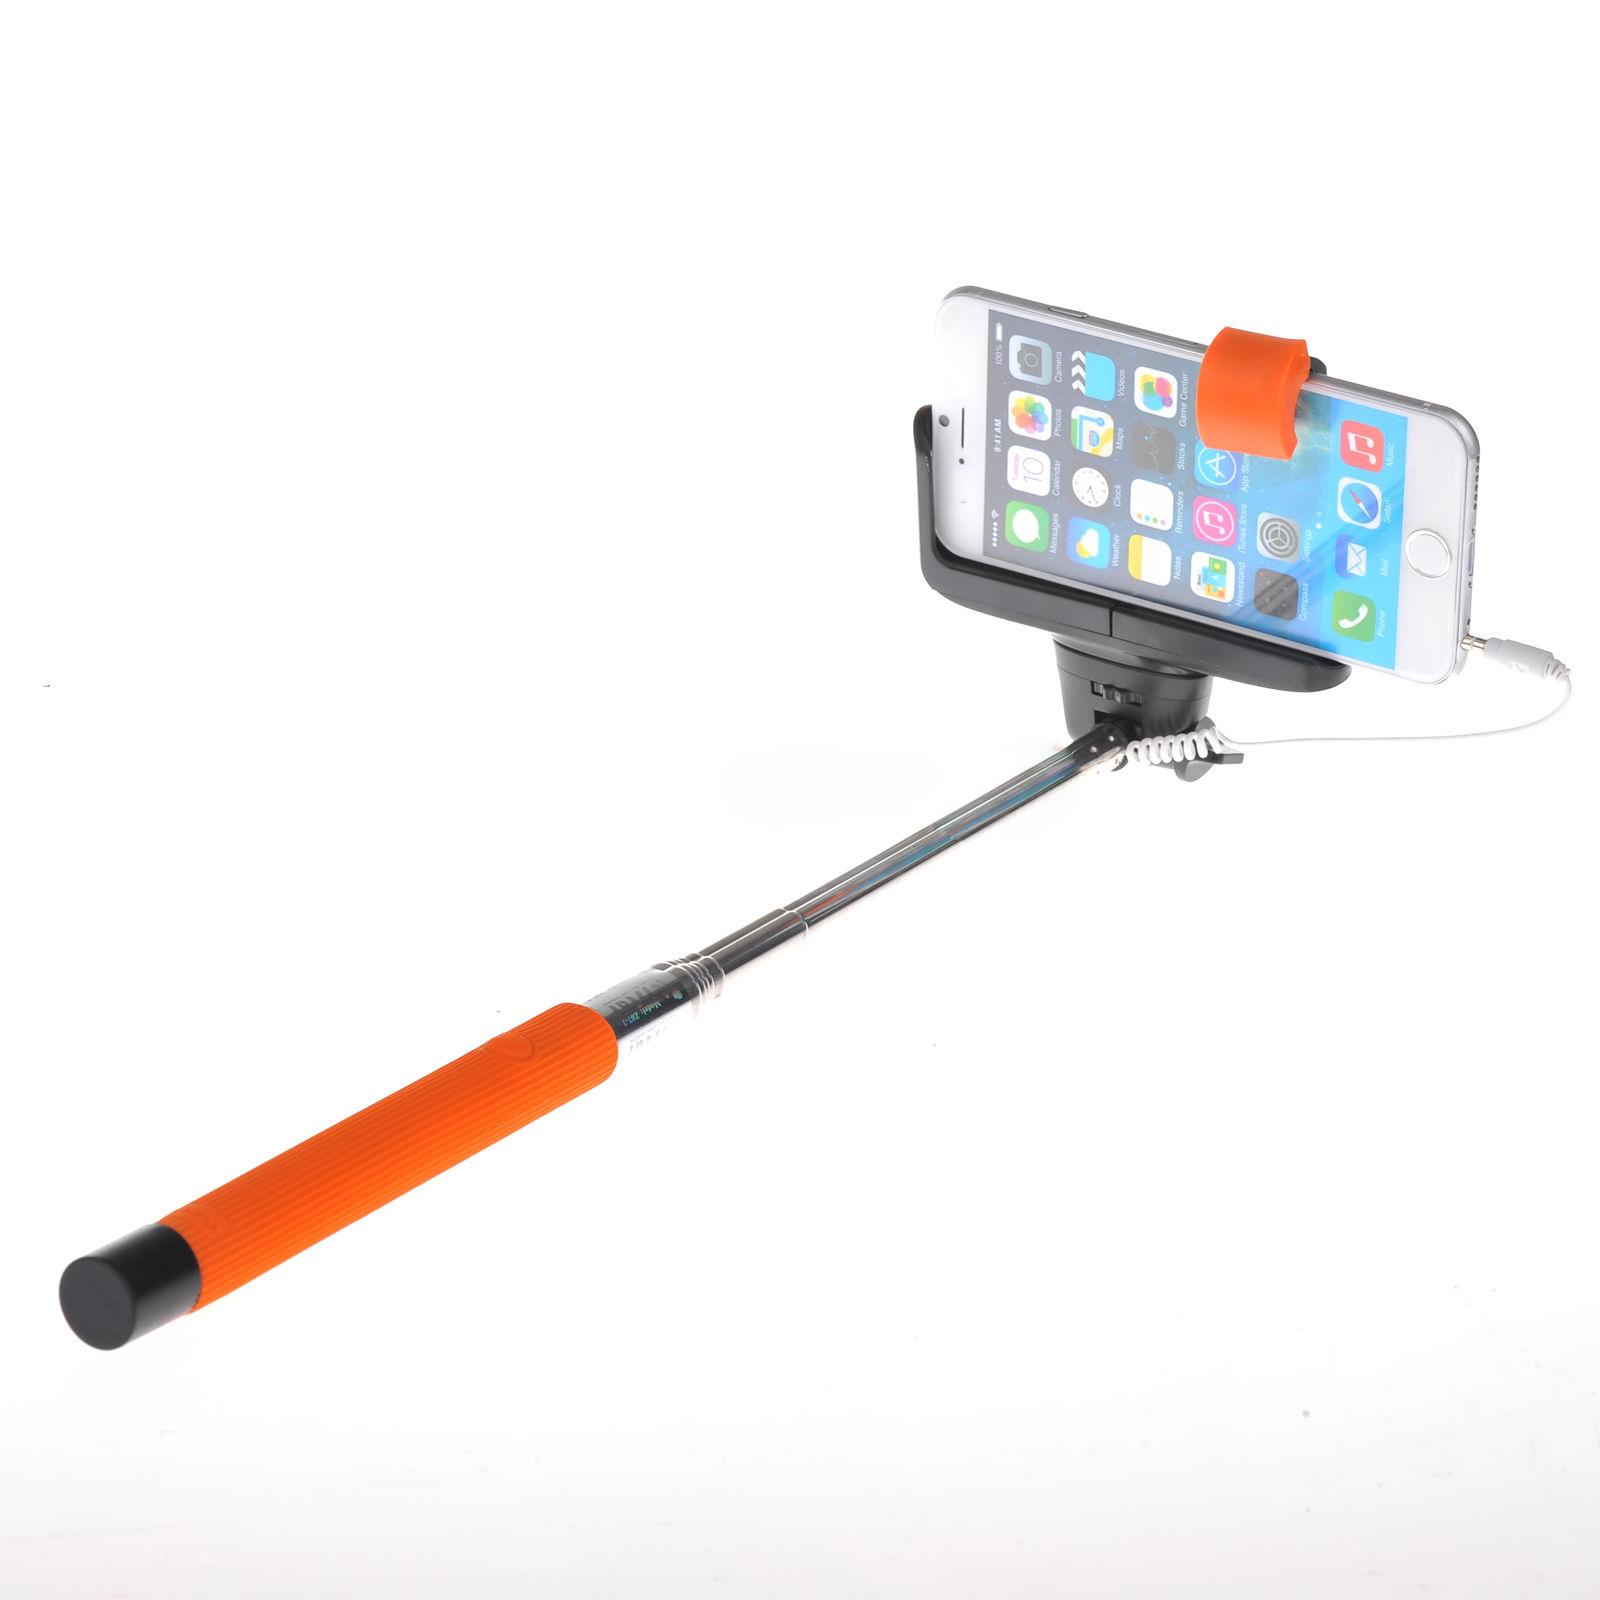 wired shutter extension pole mount monopod selfie stick holder for iphone f6 ebay. Black Bedroom Furniture Sets. Home Design Ideas